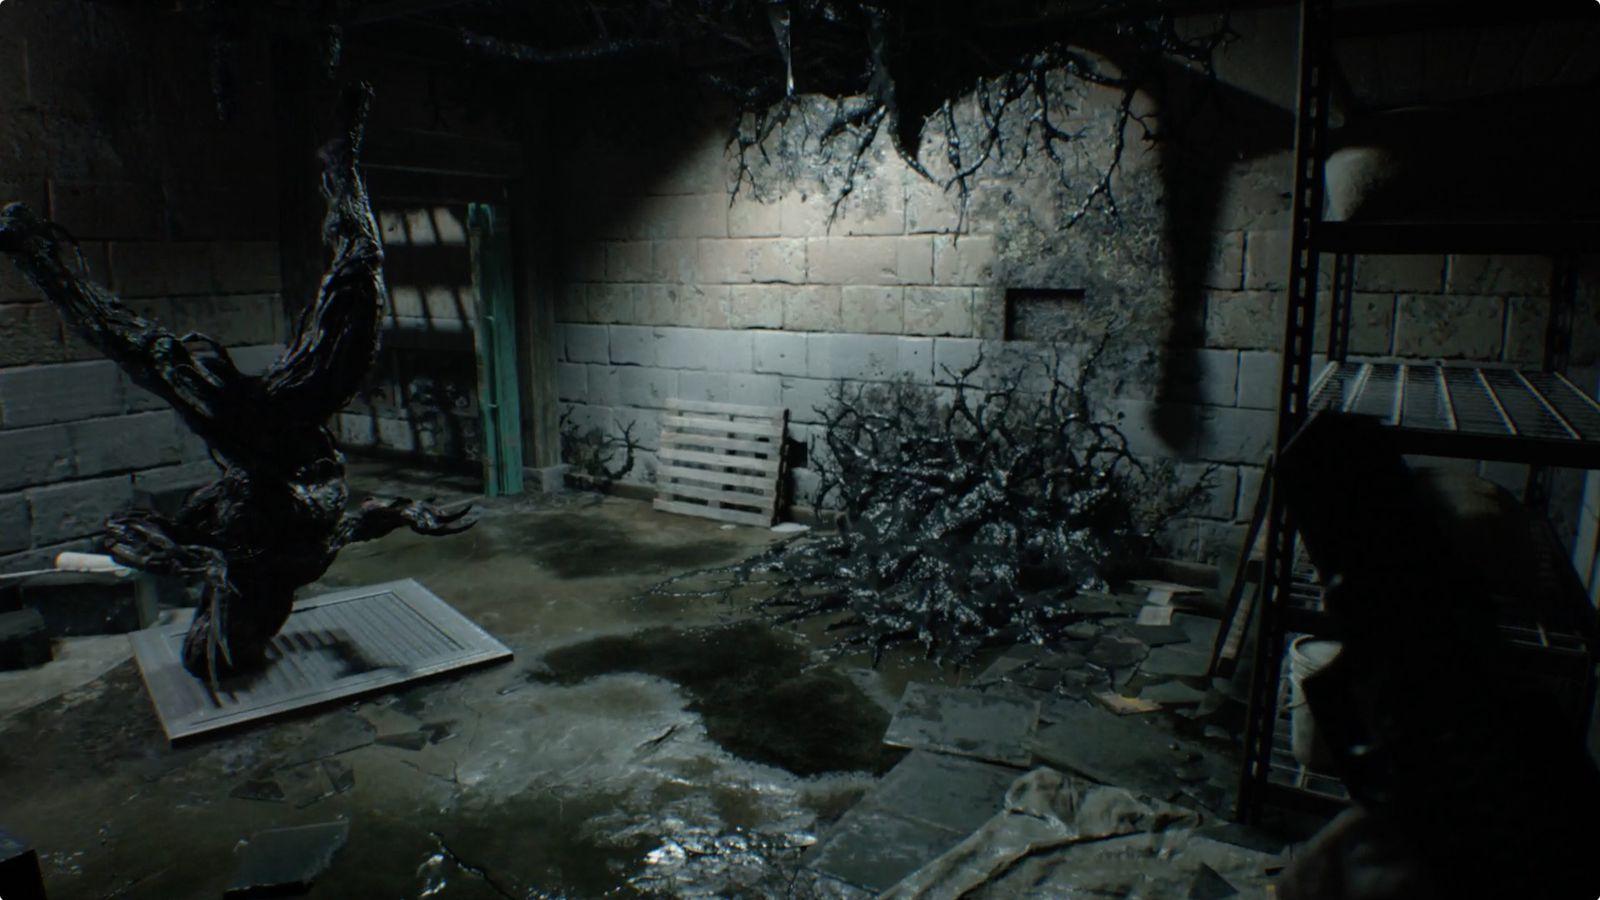 Black Mold Under Wallpaper Resident Evil 7 Guide And Walkthrough 2 3 Jack S Back And